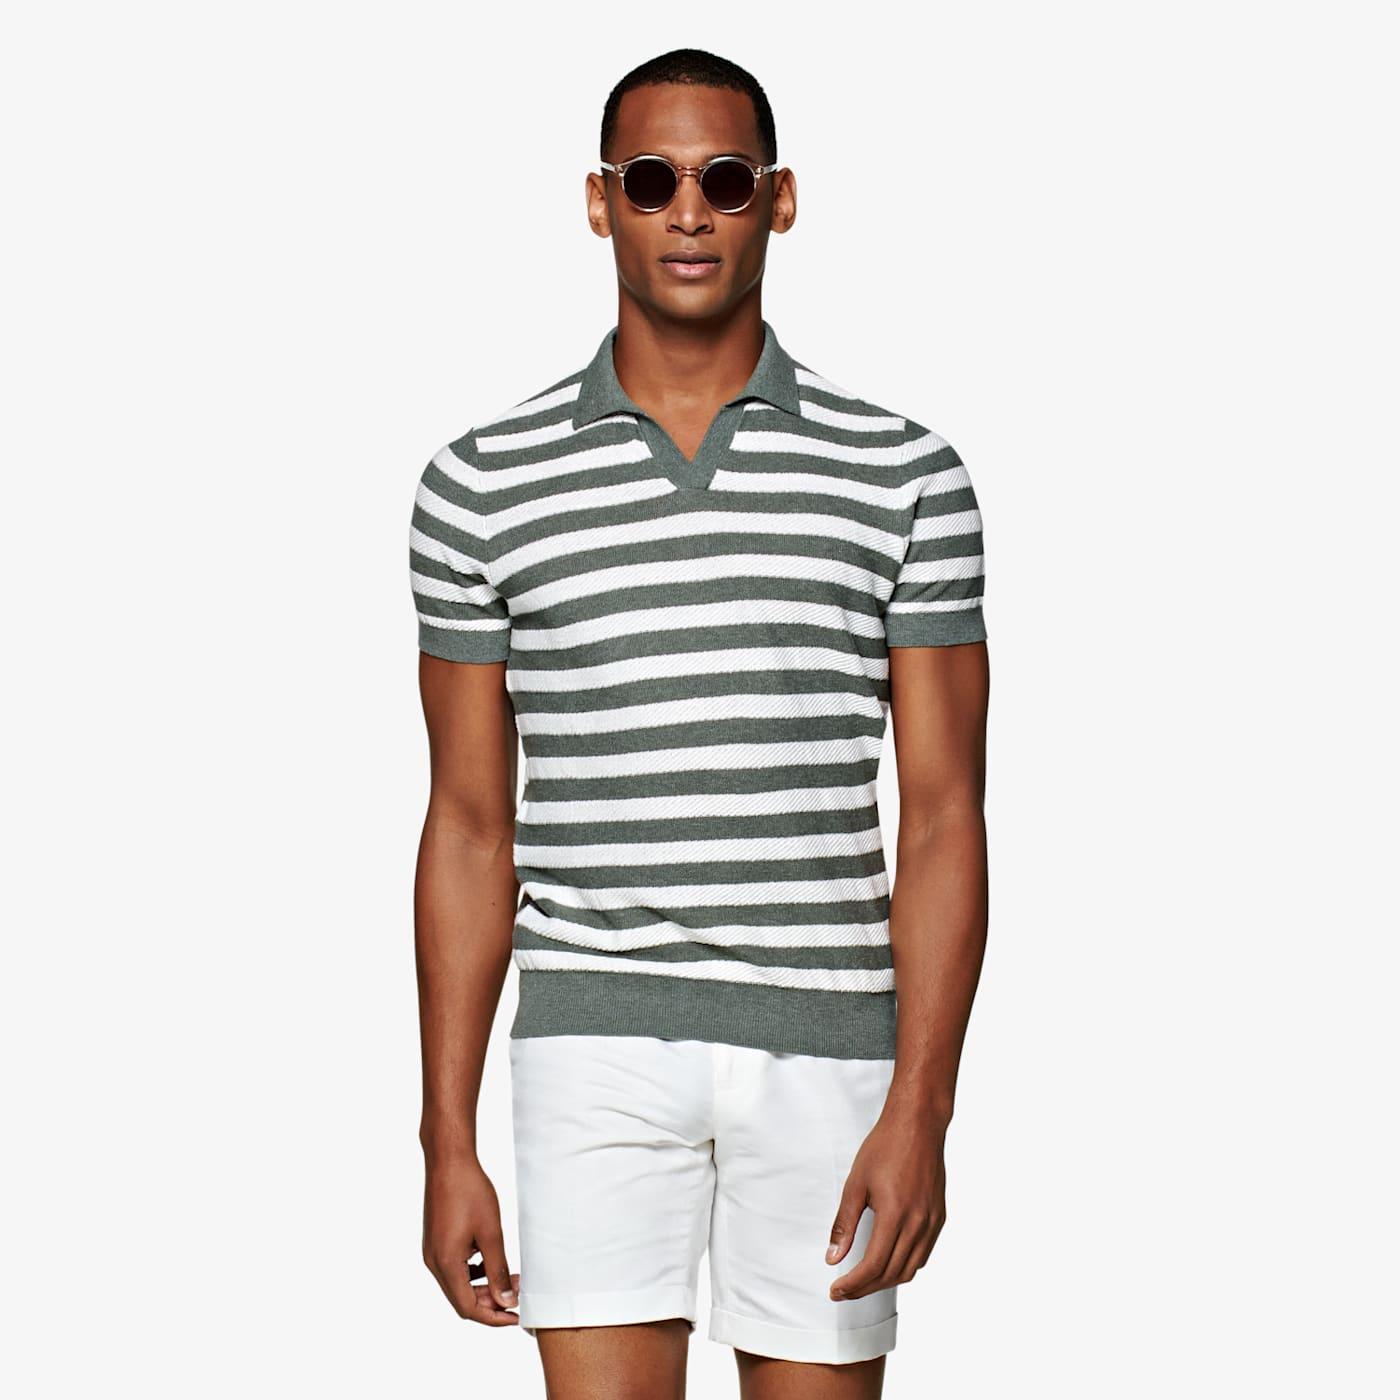 1940s Men's Clothing Dark Green Textured Stripe Buttonless Polo $79.00 AT vintagedancer.com